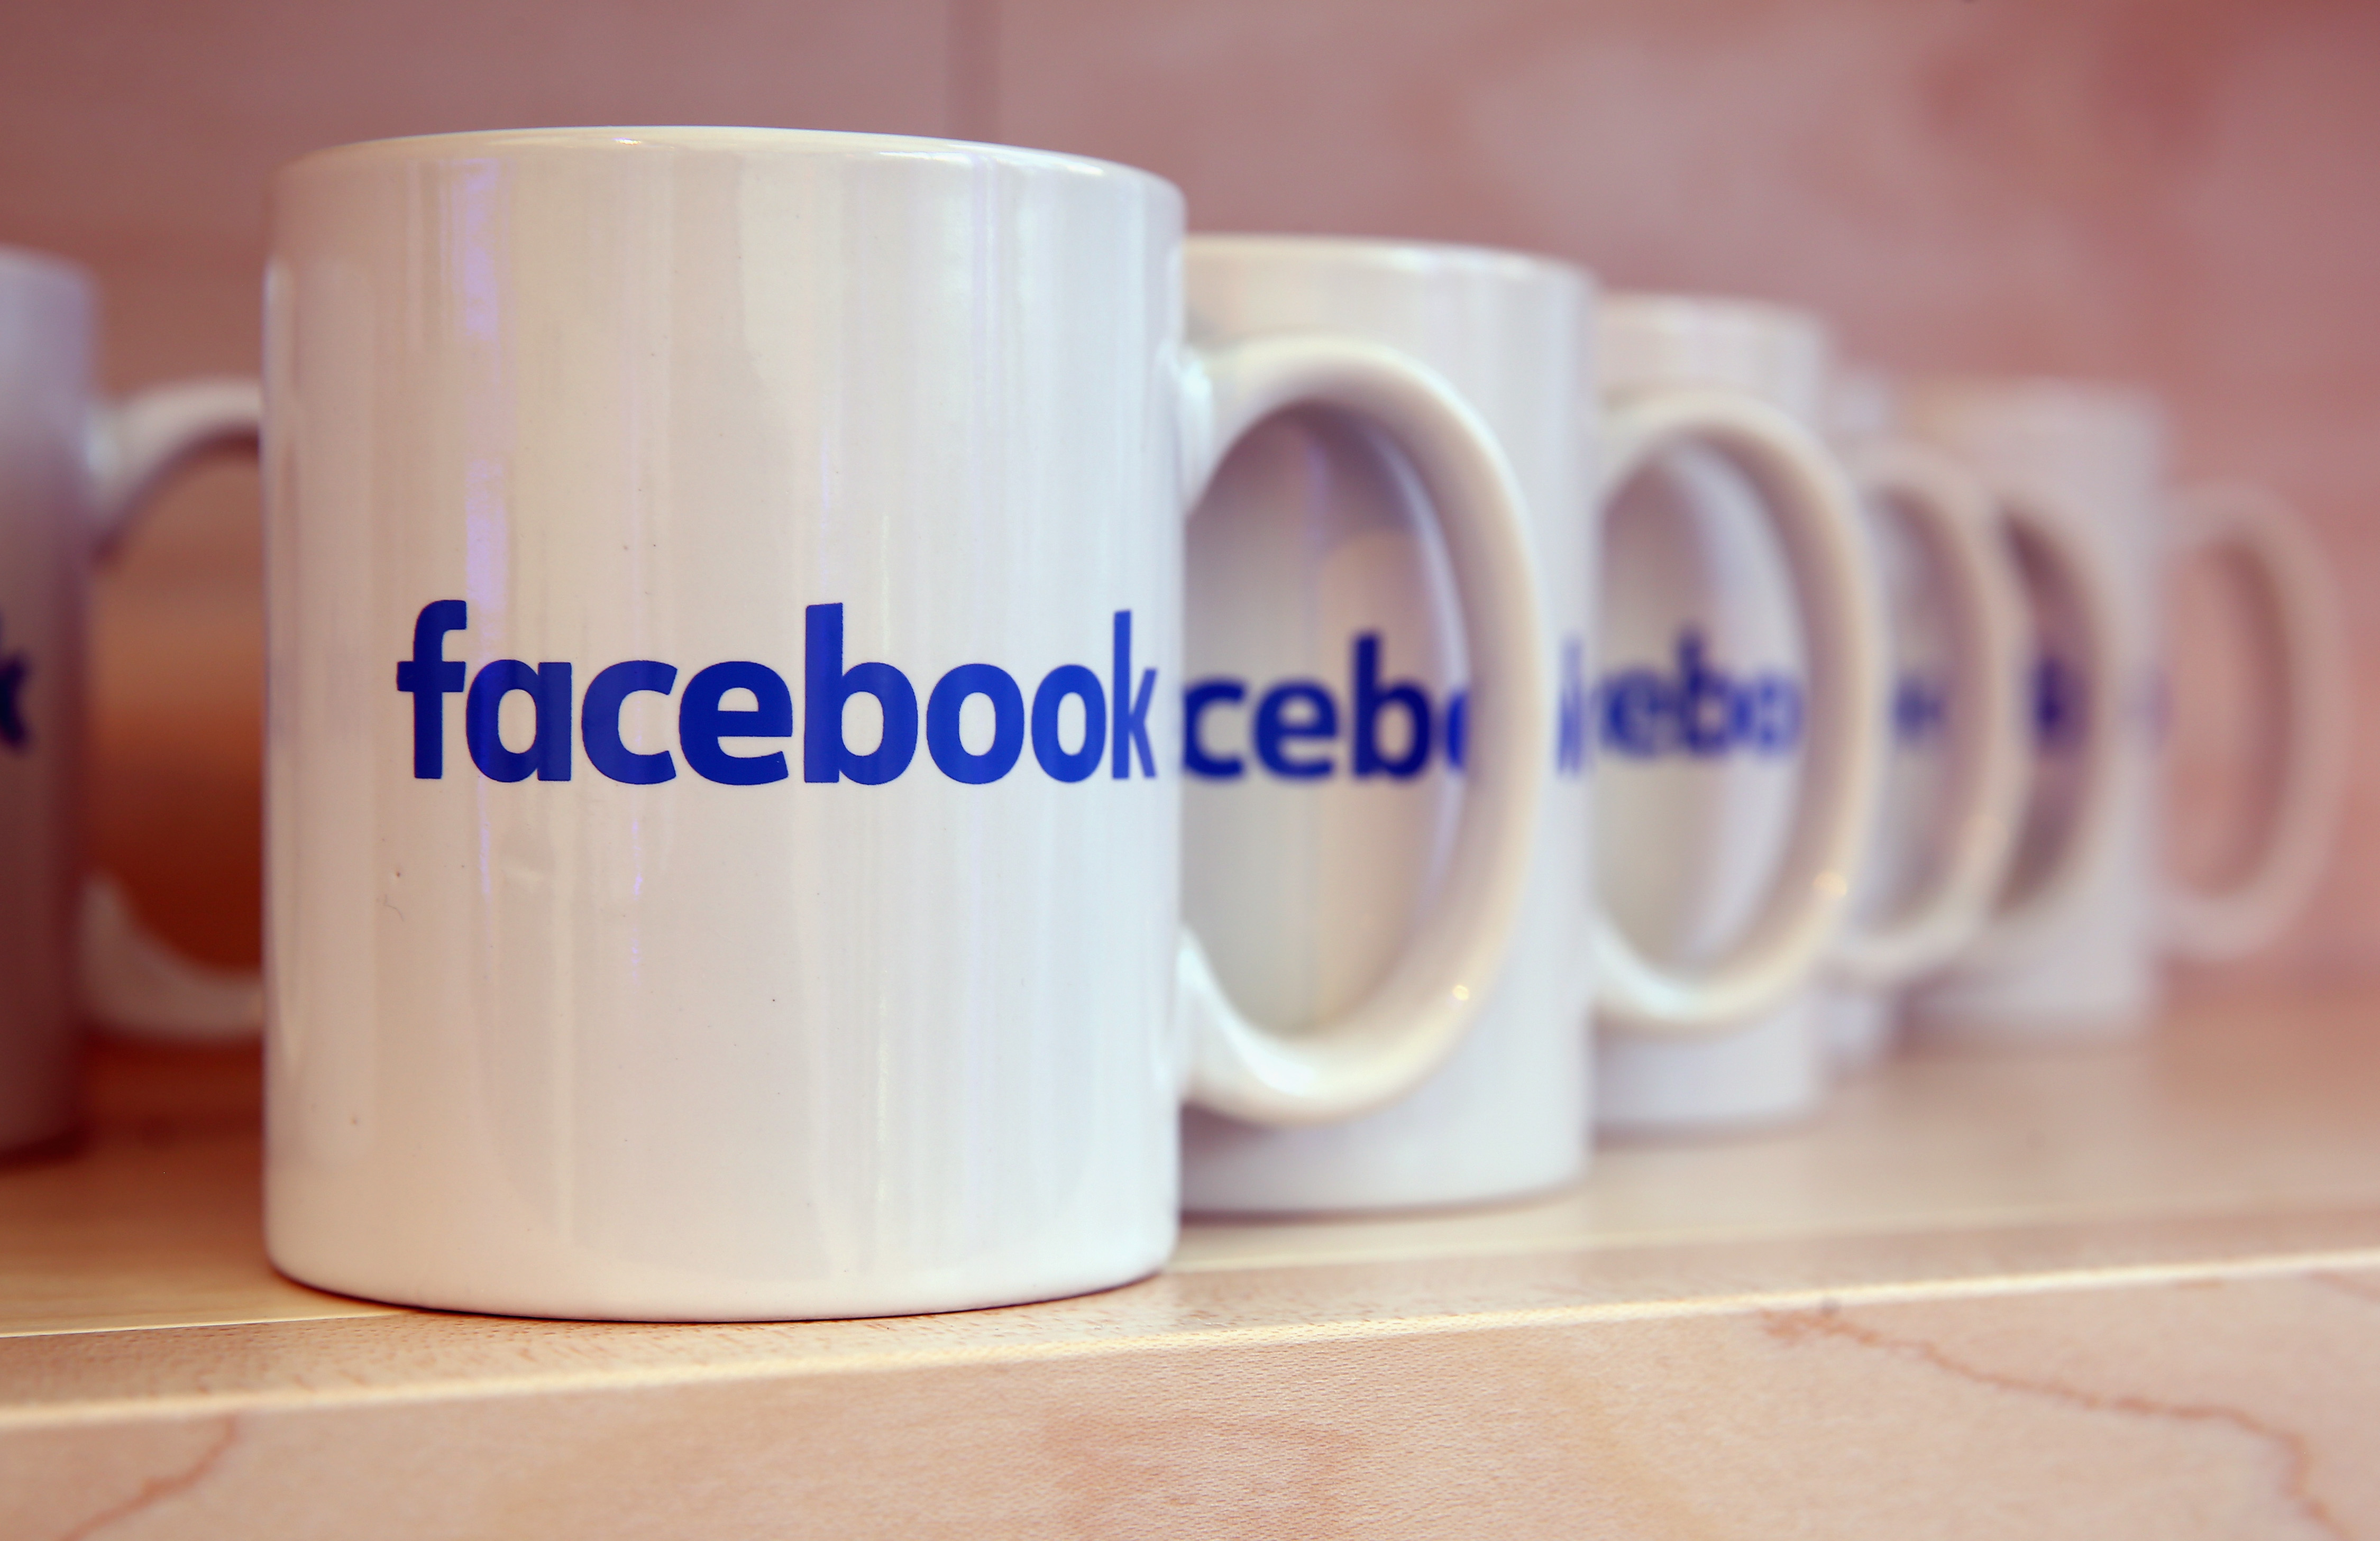 Facebook expands 'Community Boost' digital skills training program to Europe